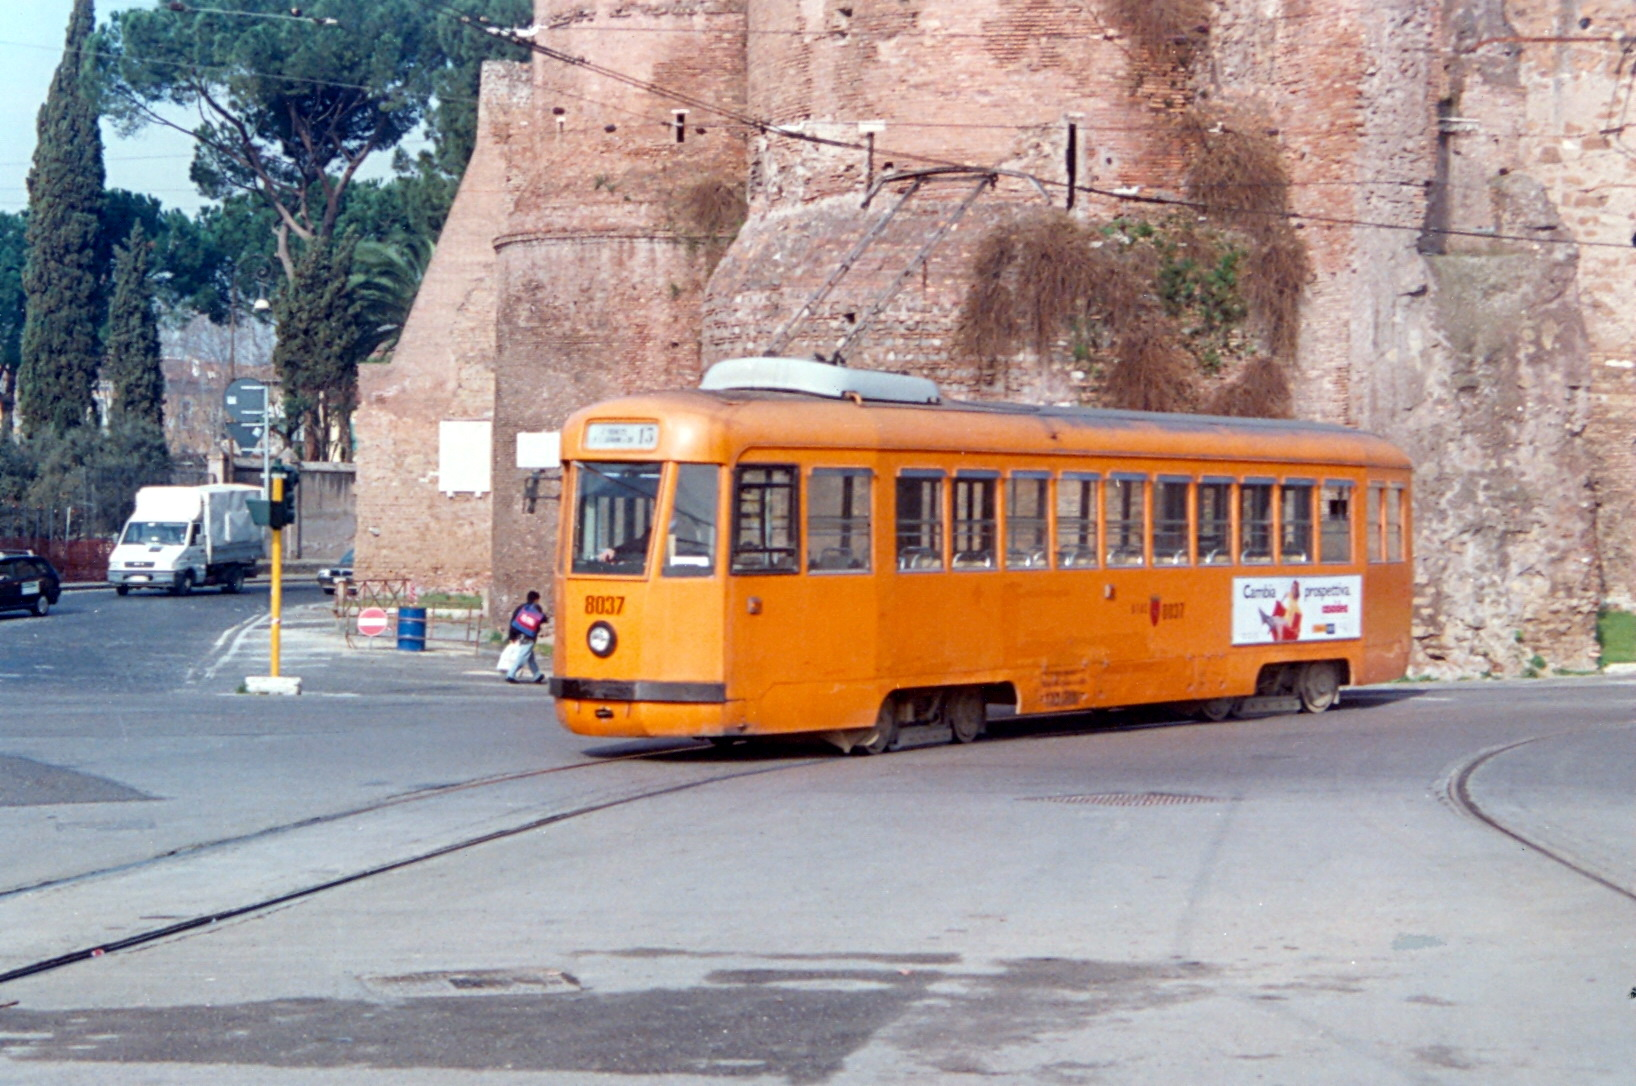 File:2127-Tram PCC 8037.jpg